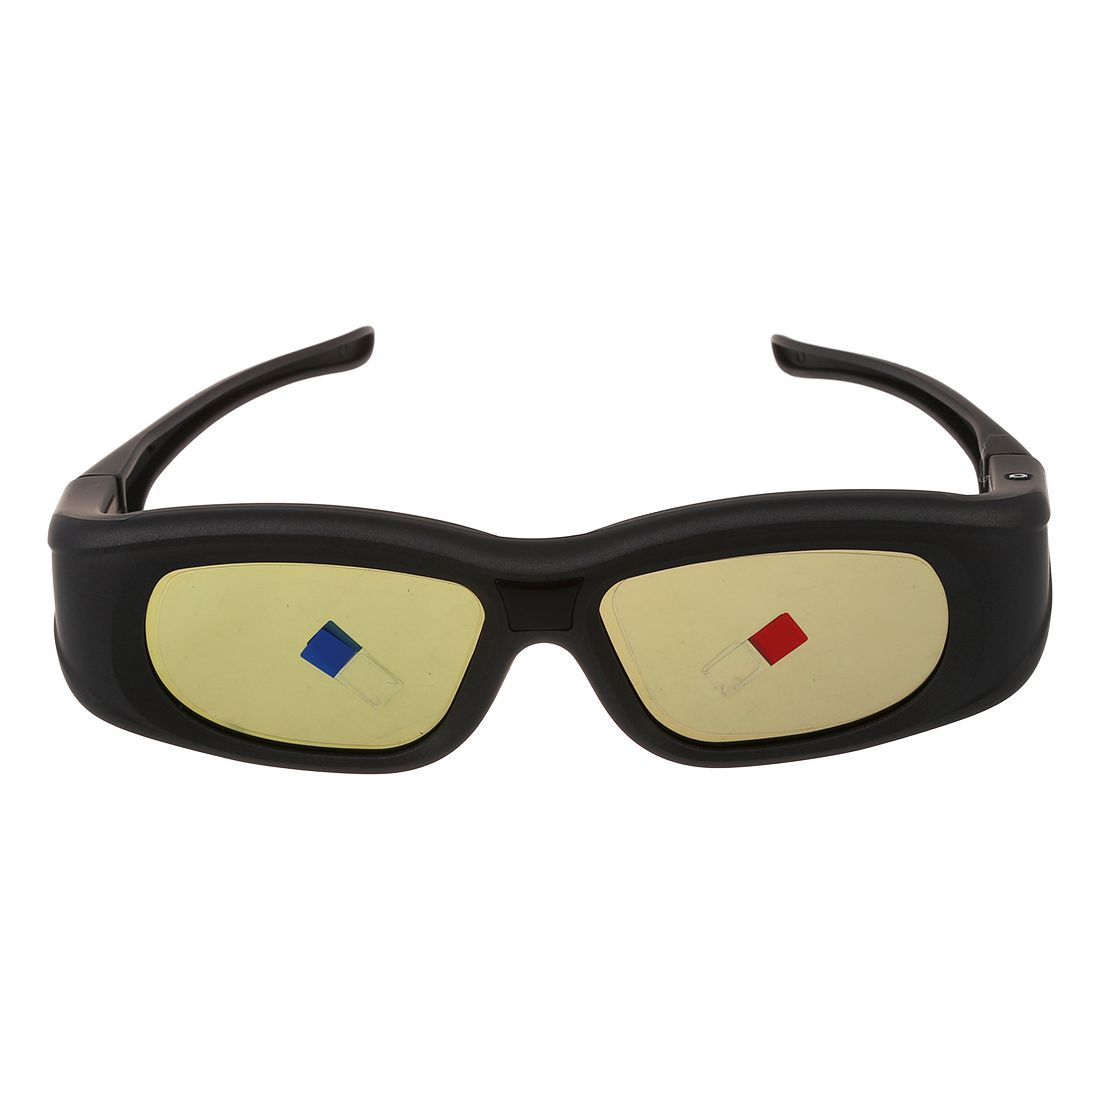 Top Deals Gonbes Bluetooth 3D Active Glasses for SAMSUNG PS64D8000FJ PANASONIC tc p42ut50 TX P50UT50E PANASONIC TX-P50GT50 TX